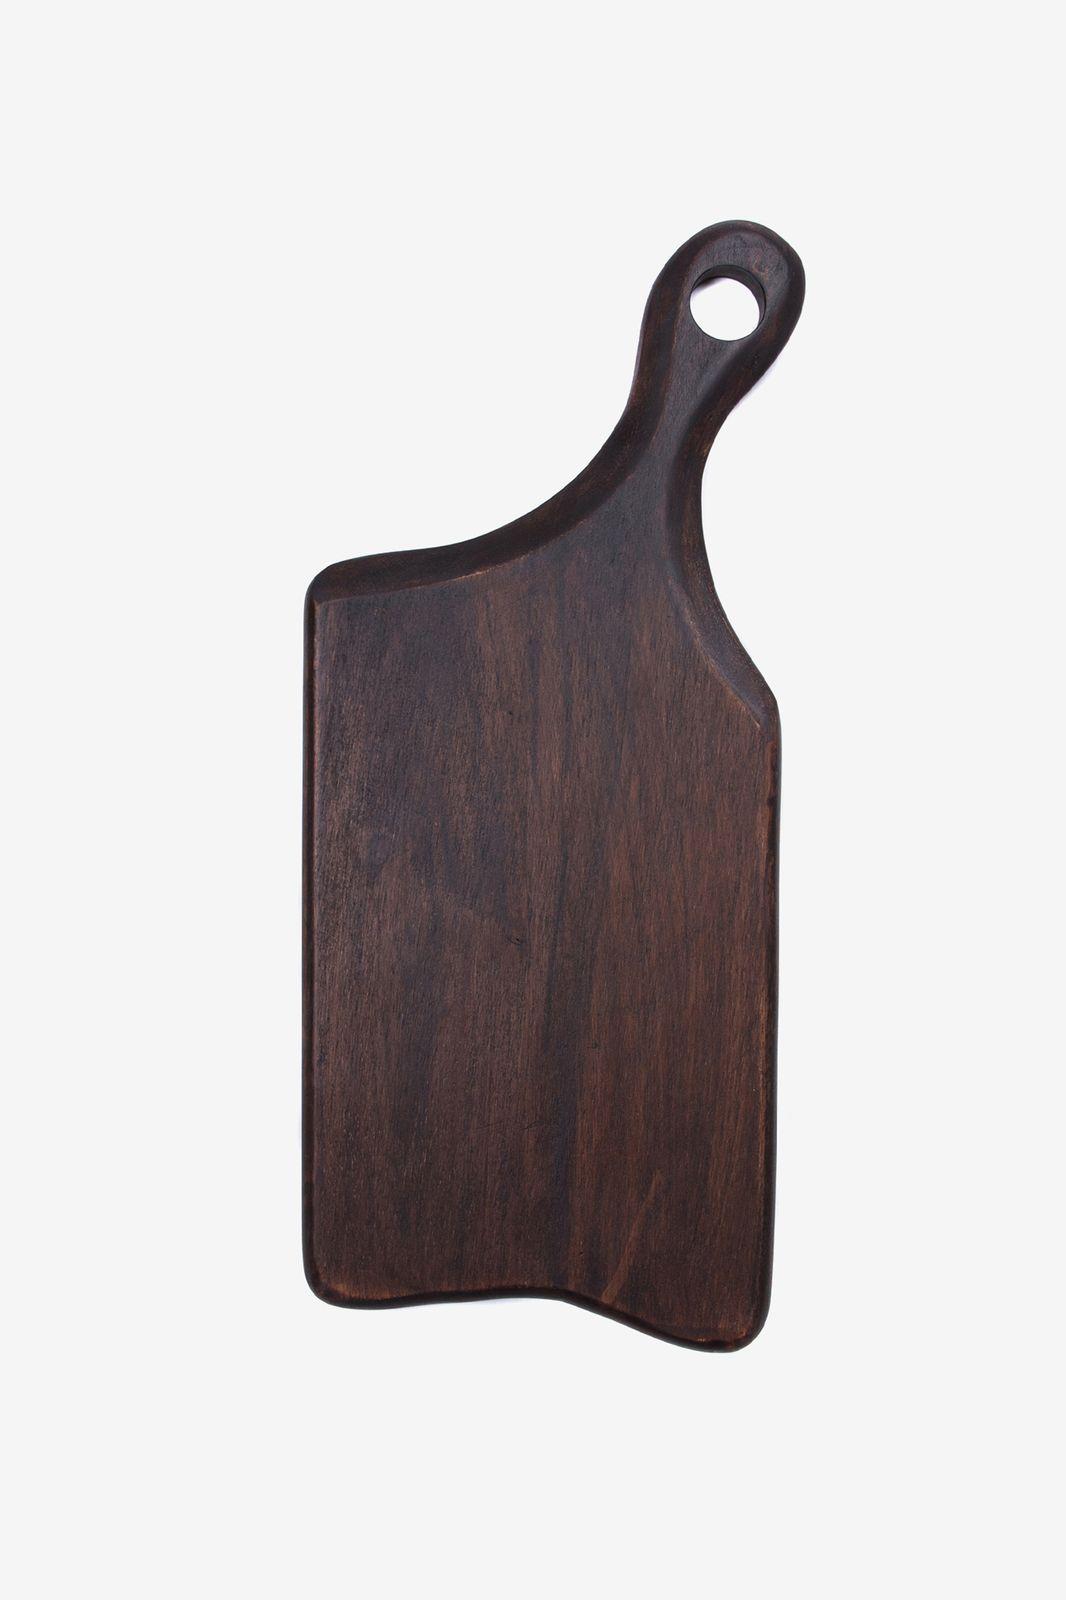 Donkerbruine serveerplank acacia hout - Homeland | Sissy-Boy